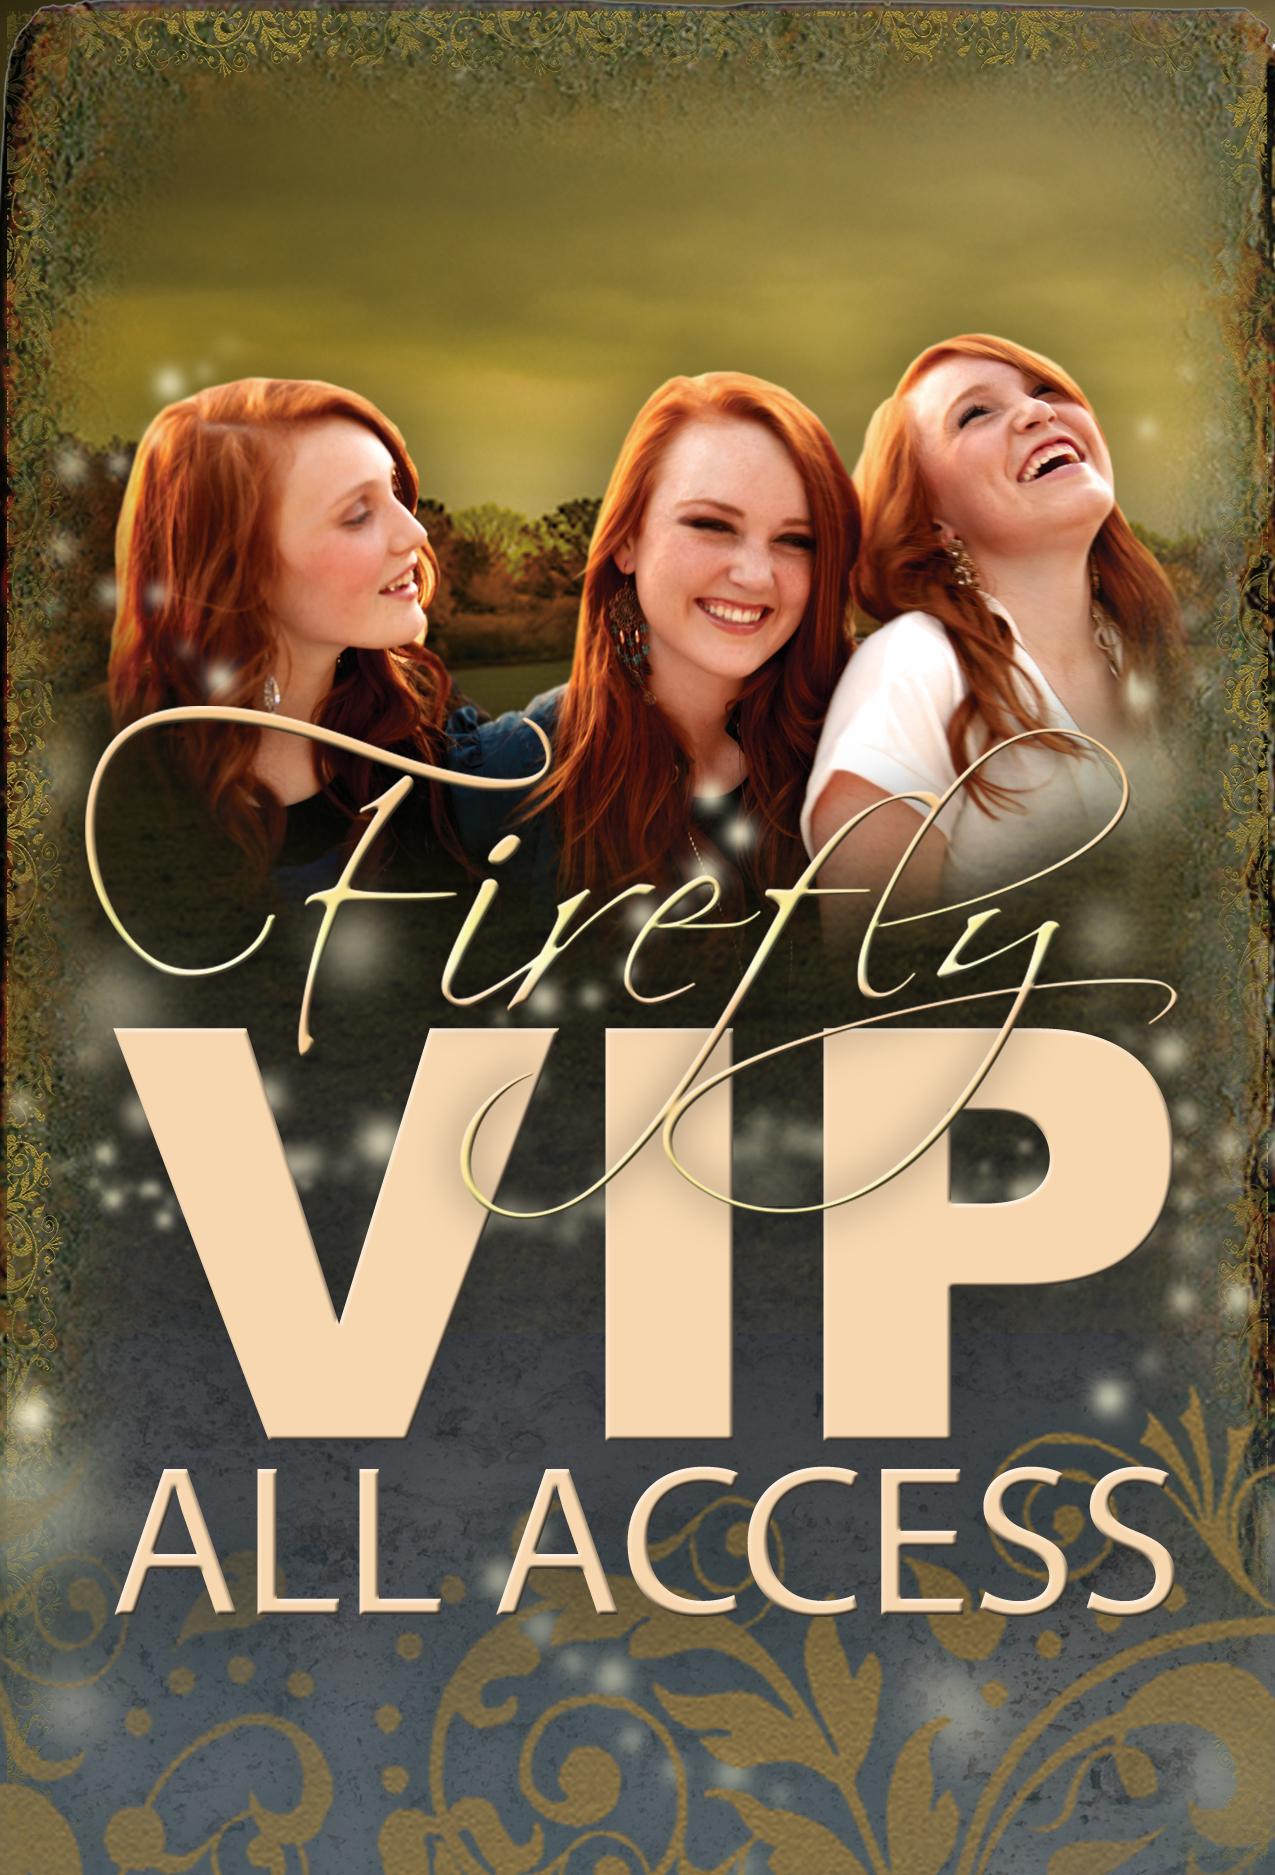 Firefly VIP Lanyards